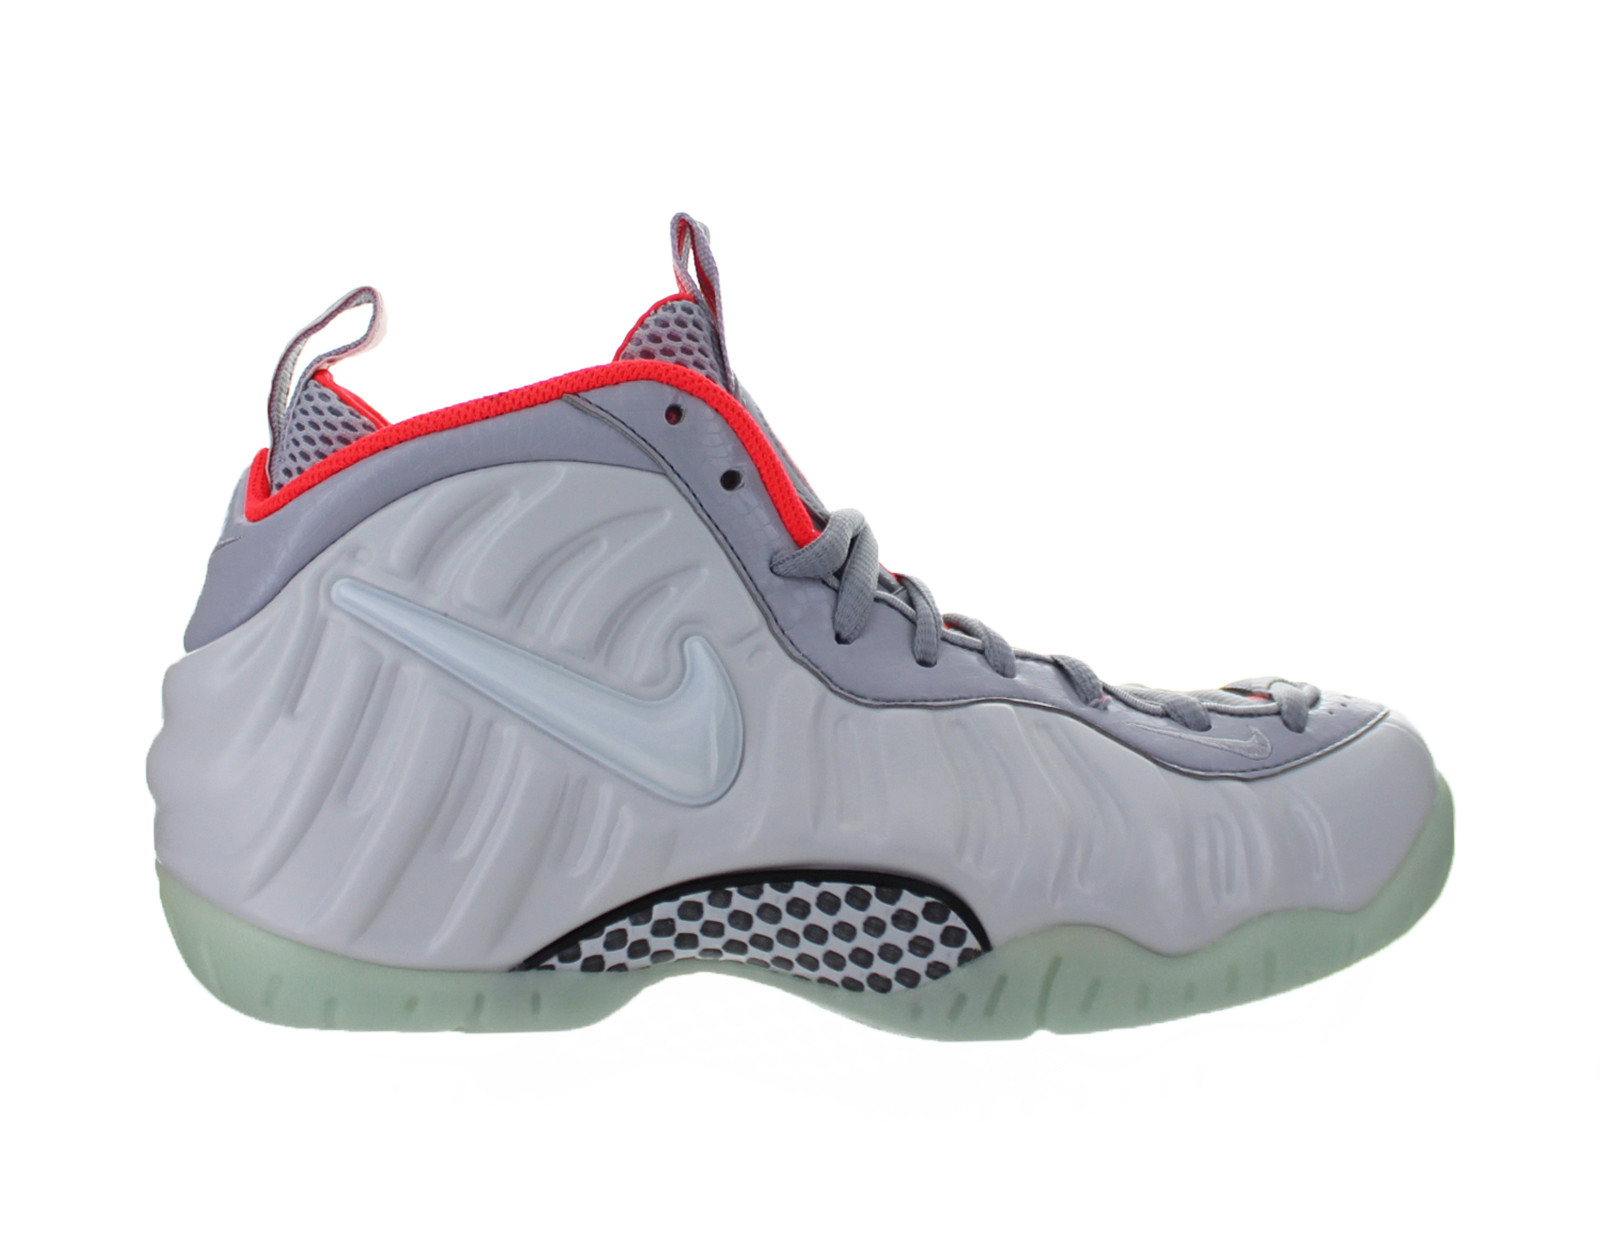 Nike Air Foamposite Pro Premium Men's Shoes Pure Platinum Wolf Grey616750-003 by Nike